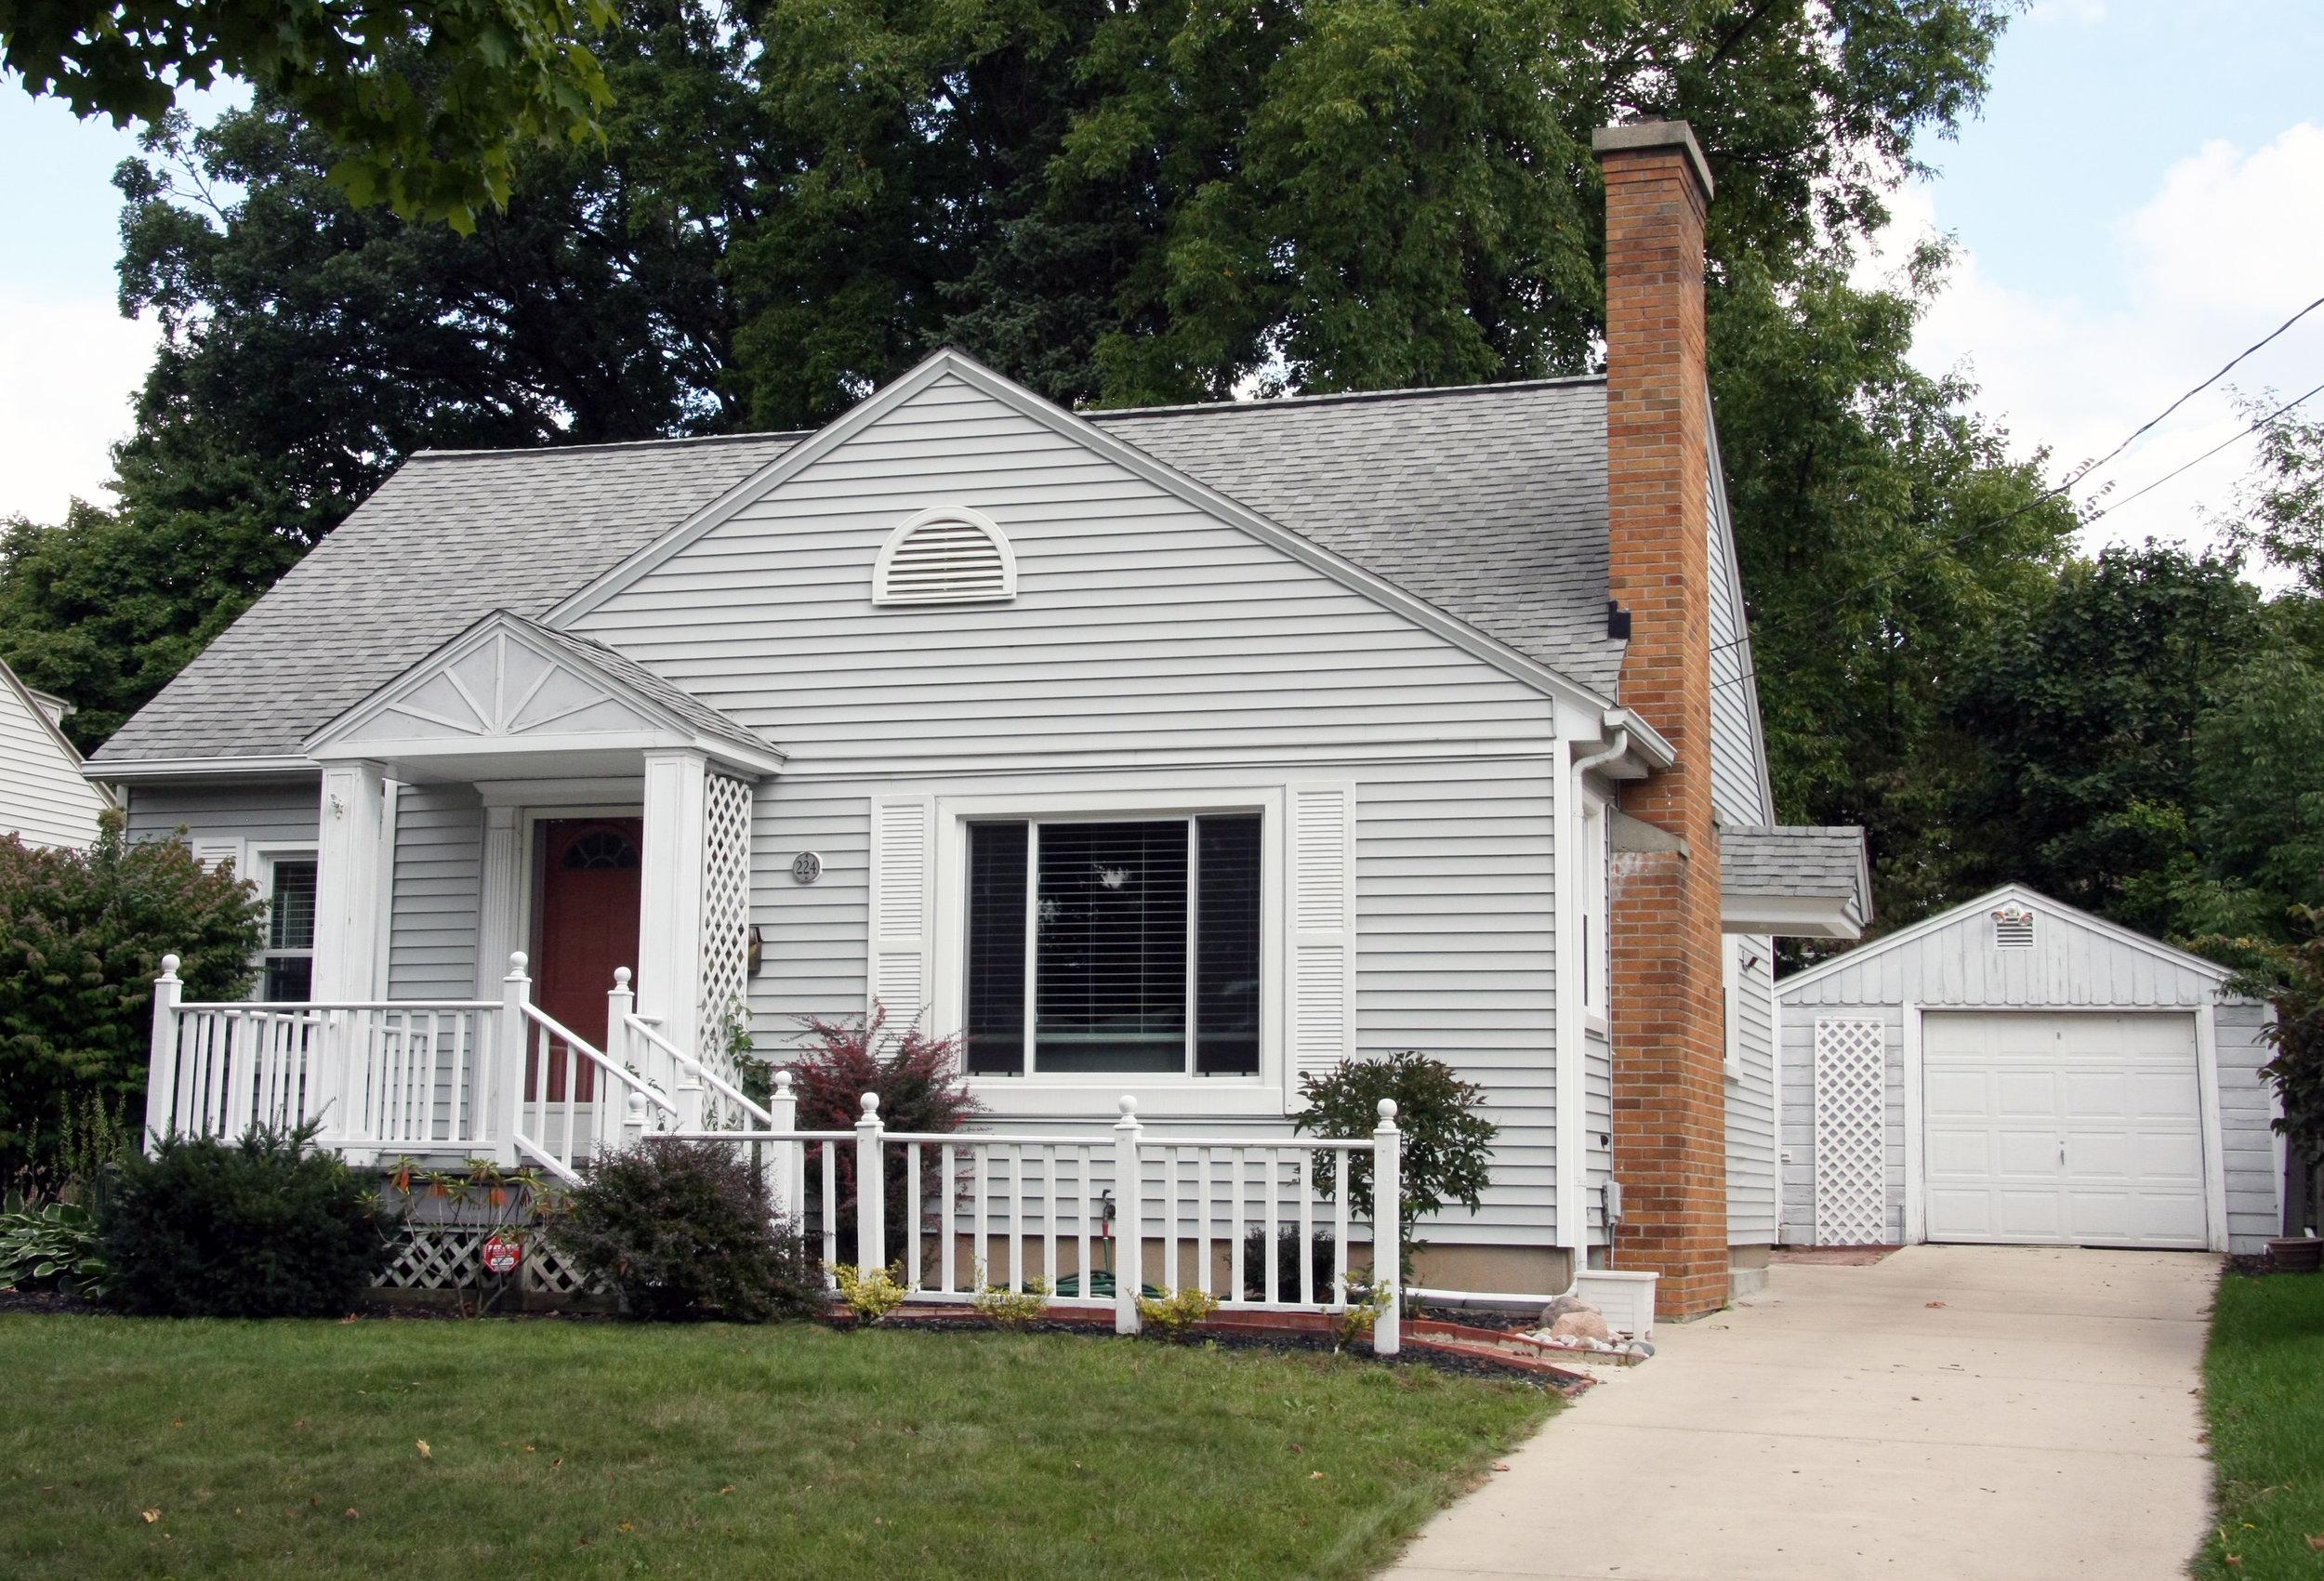 224 Wallinwood Street NE, Grand Rapids, MI- Adorable 3 bedroom near Aquinas College